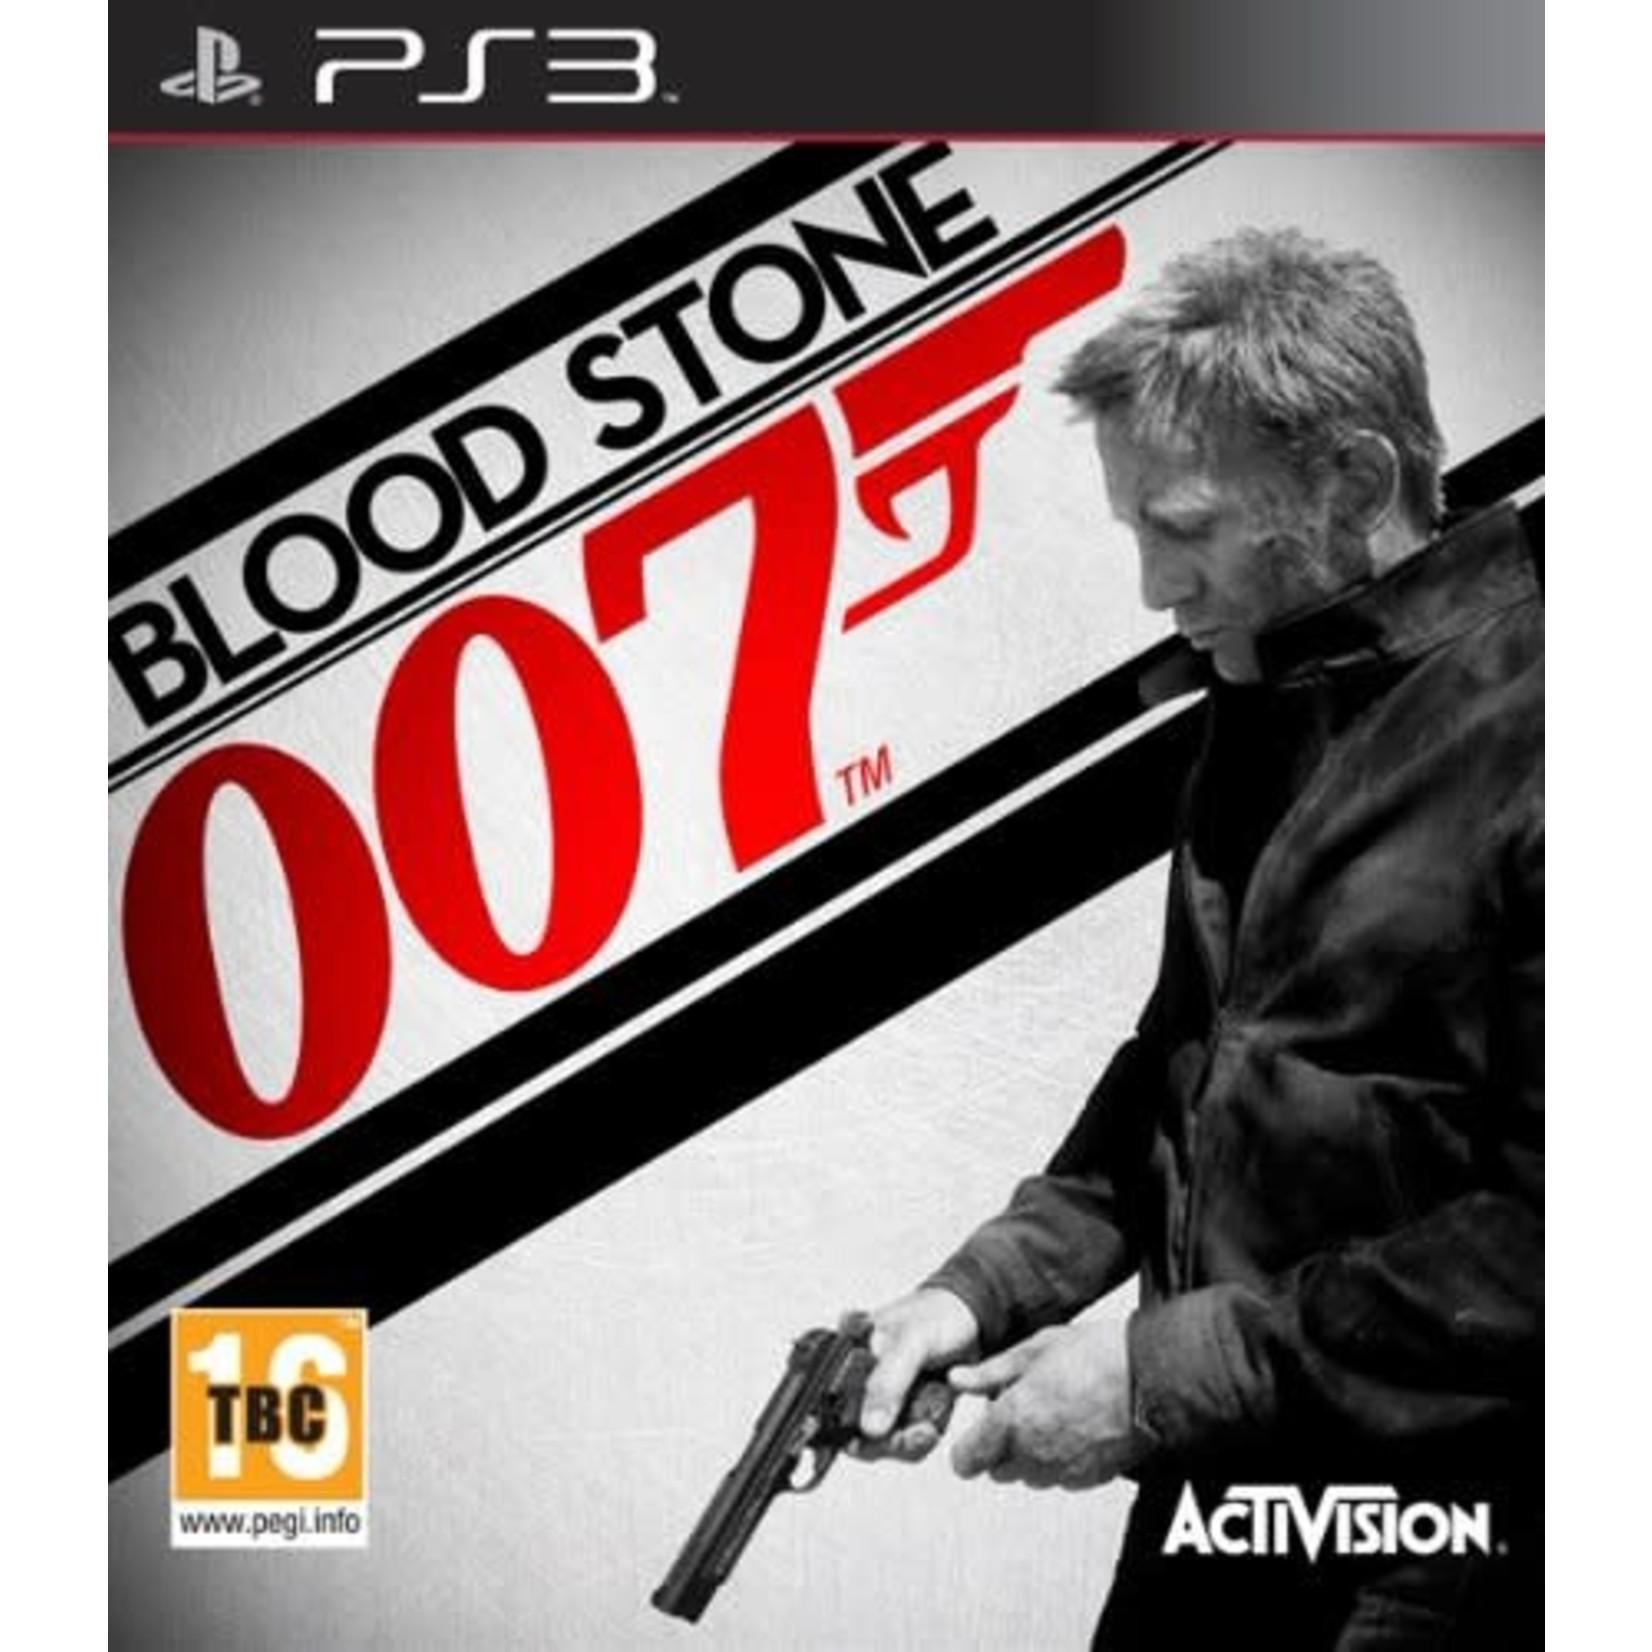 PS3U-007 BLOOD STONE